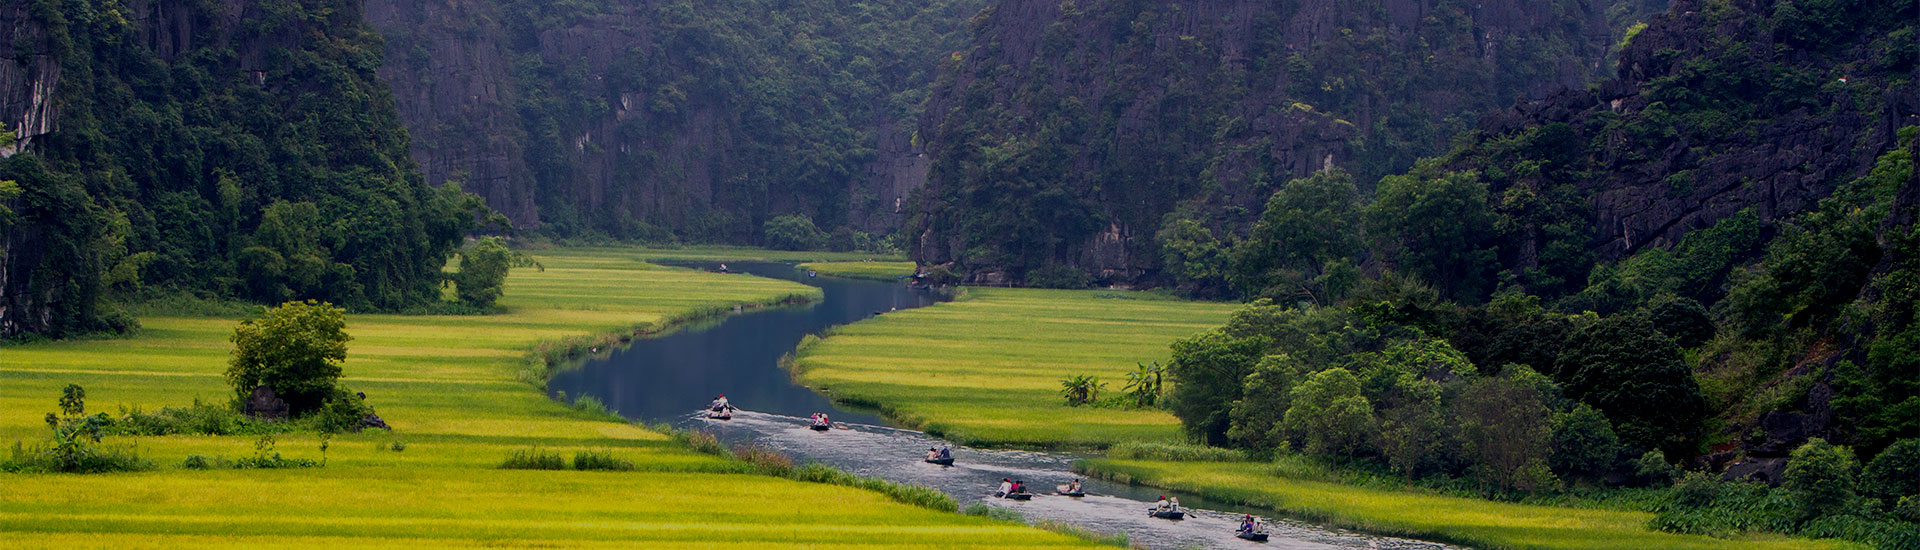 Voyage Photos Vietnam